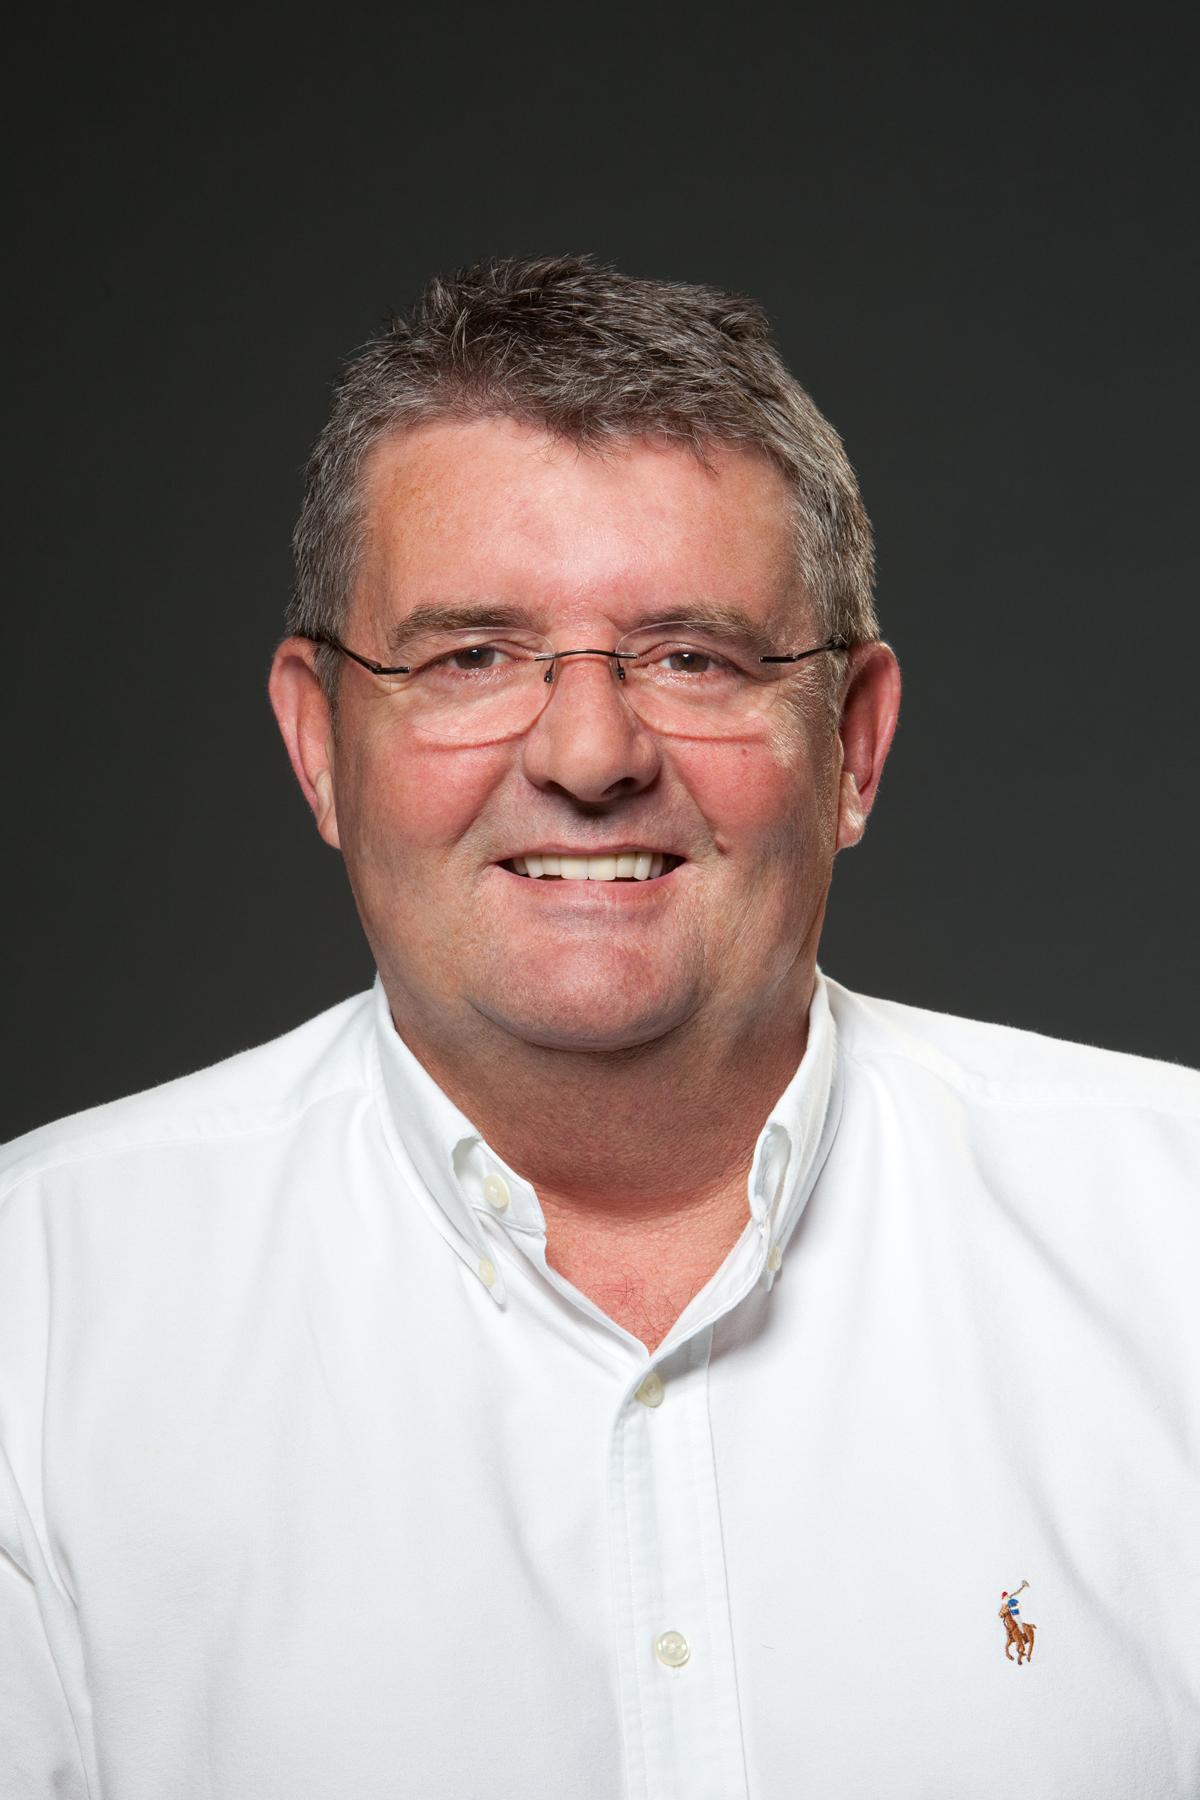 Steve Meylan